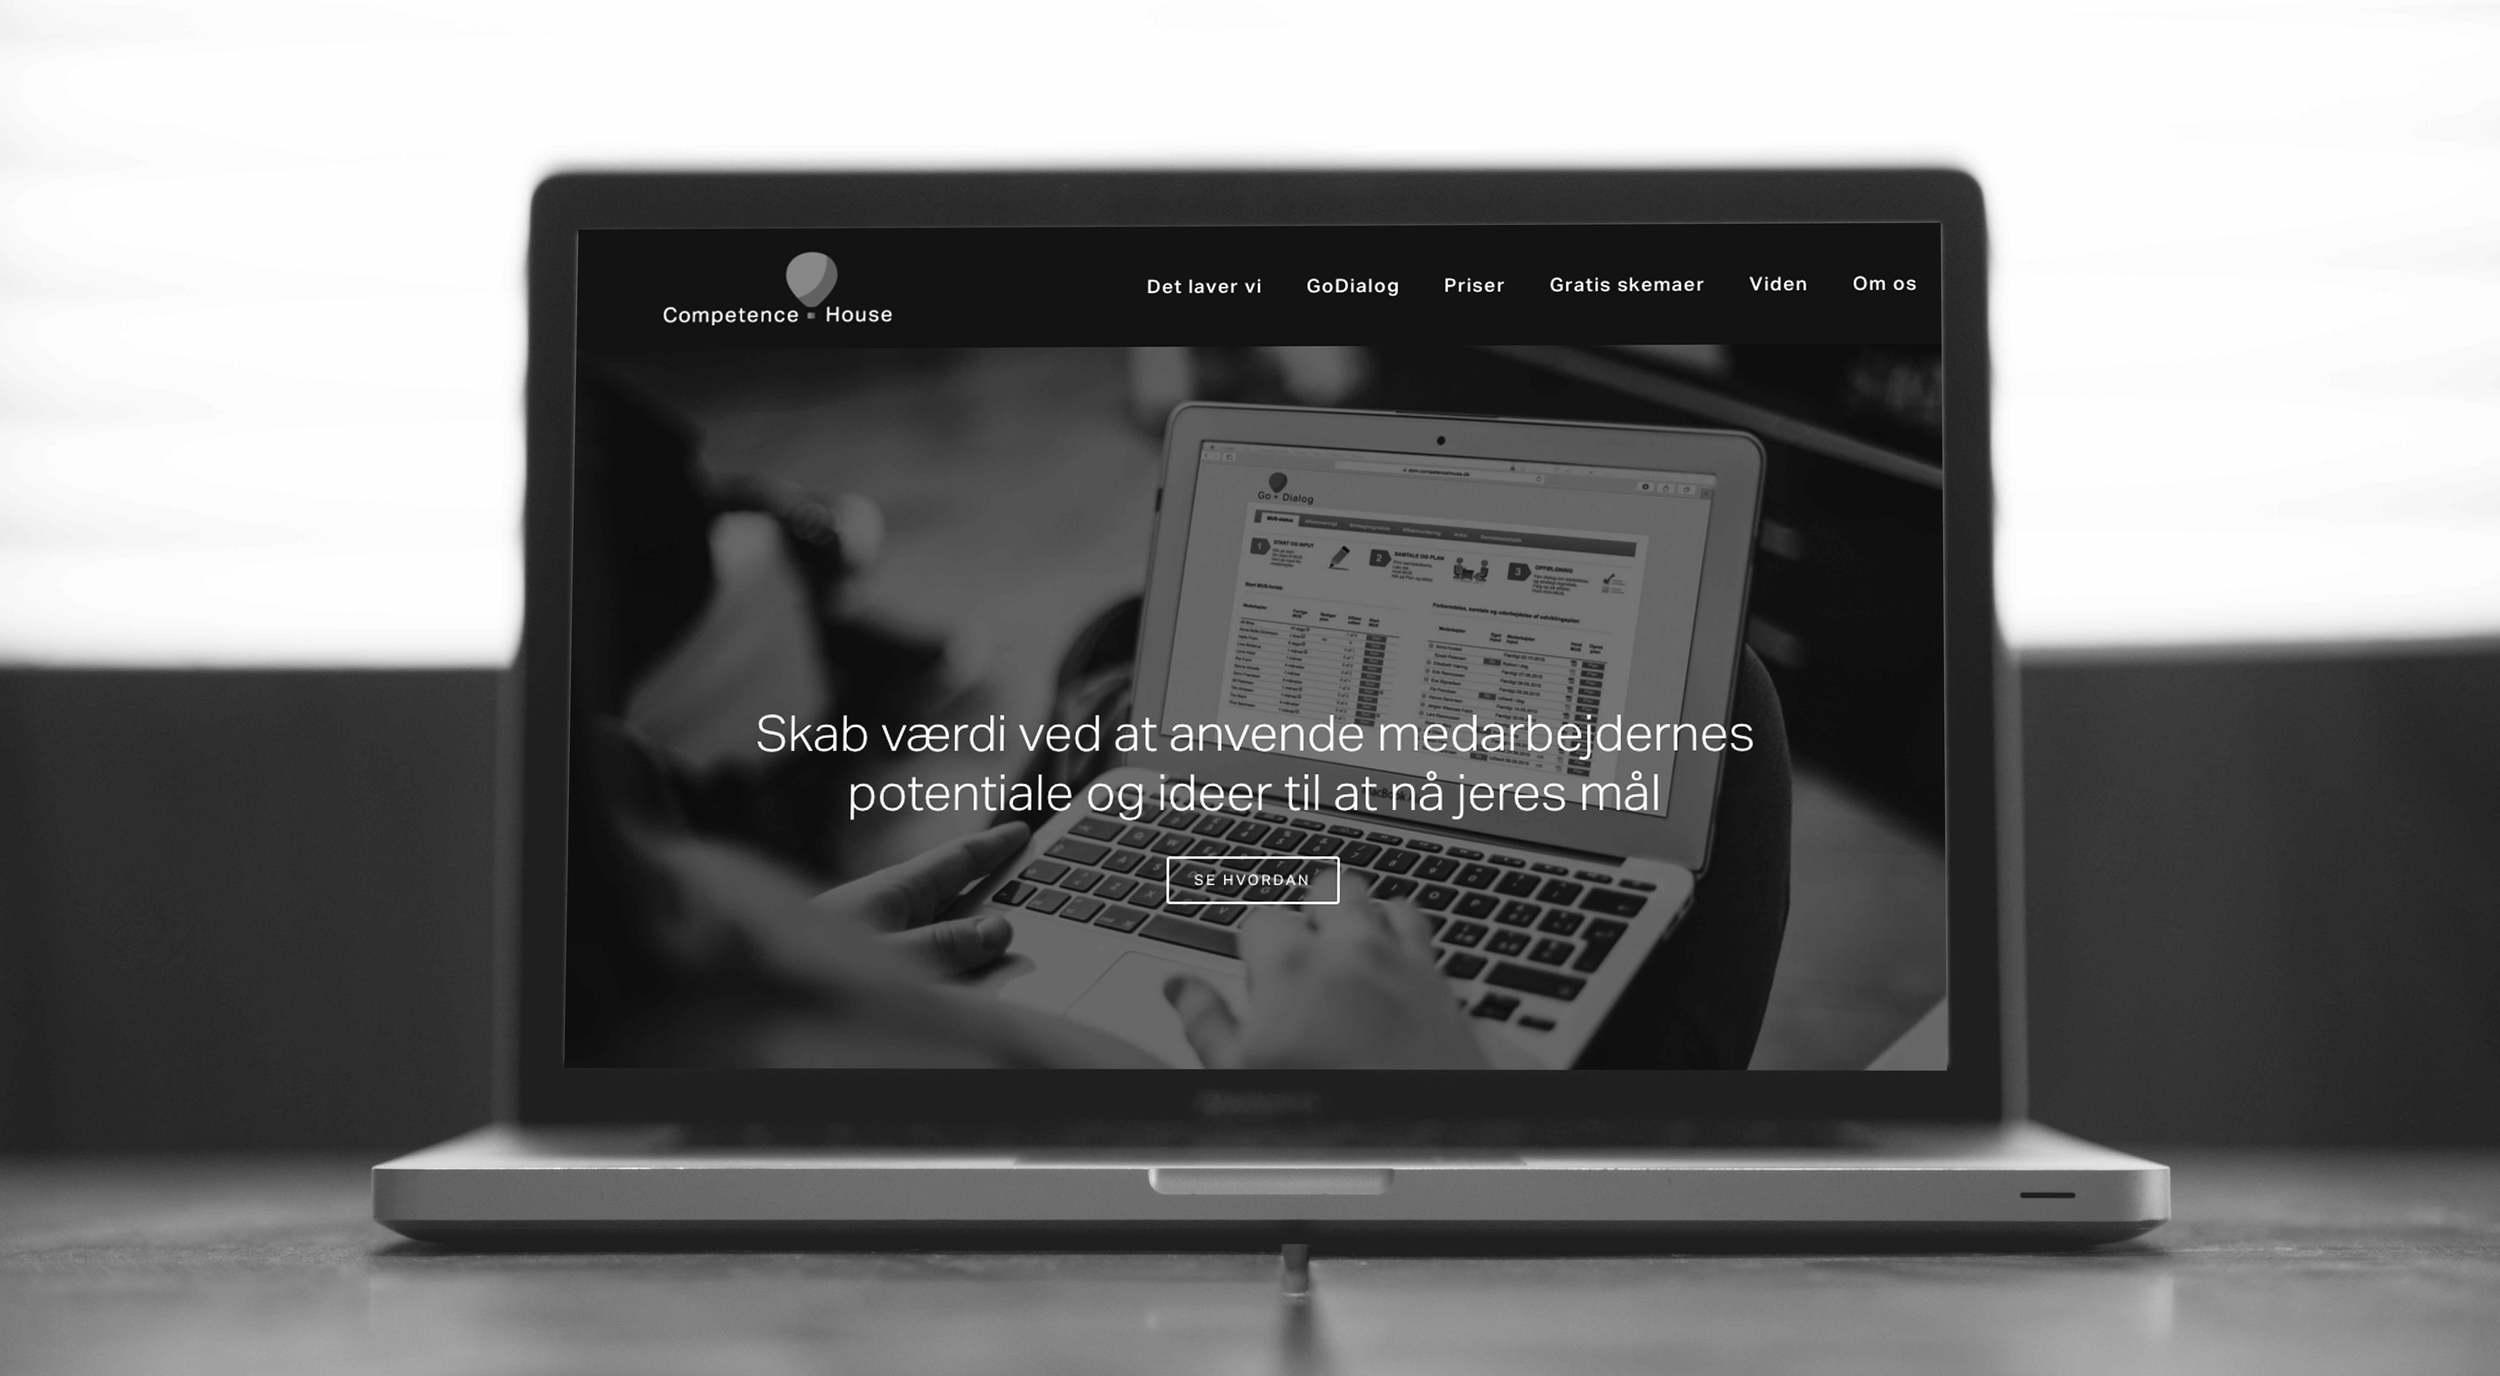 #responsivhjemmeside  #informationsarkitektur #digitaltdesign  #logo